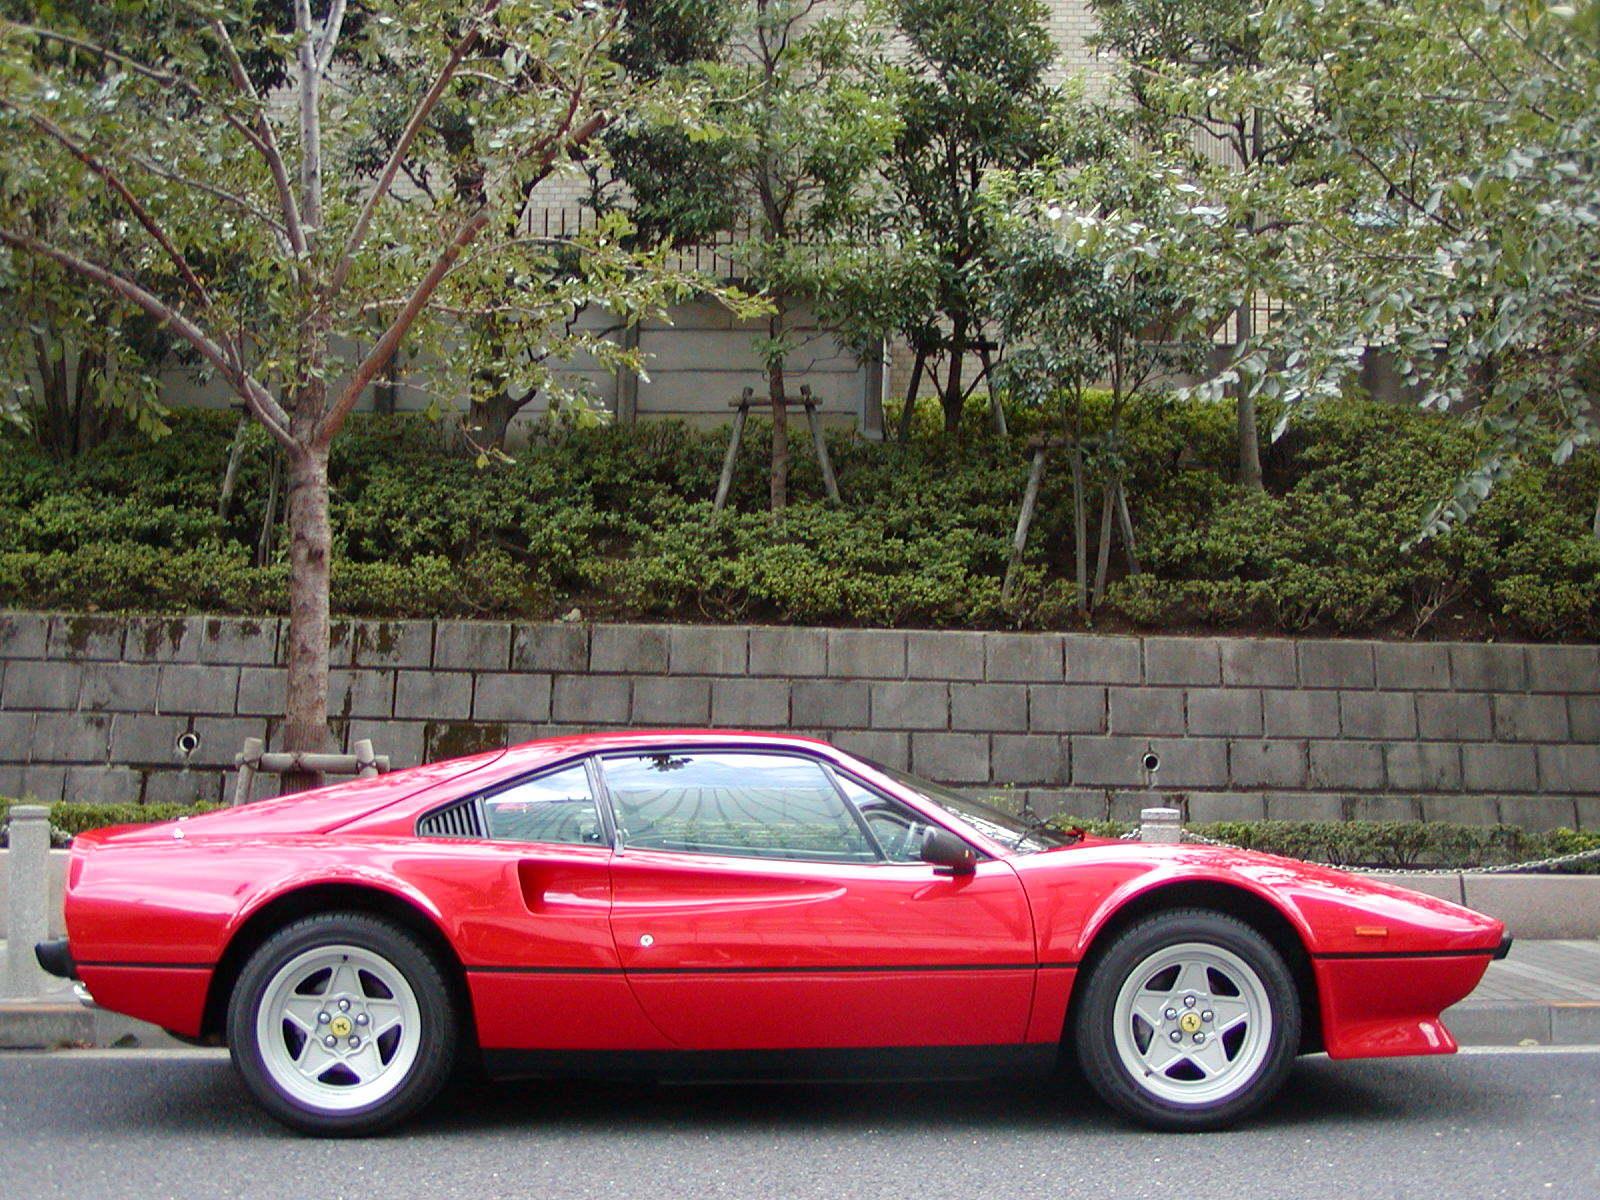 small Ferrari の造形の変化_a0129711_22455844.jpg